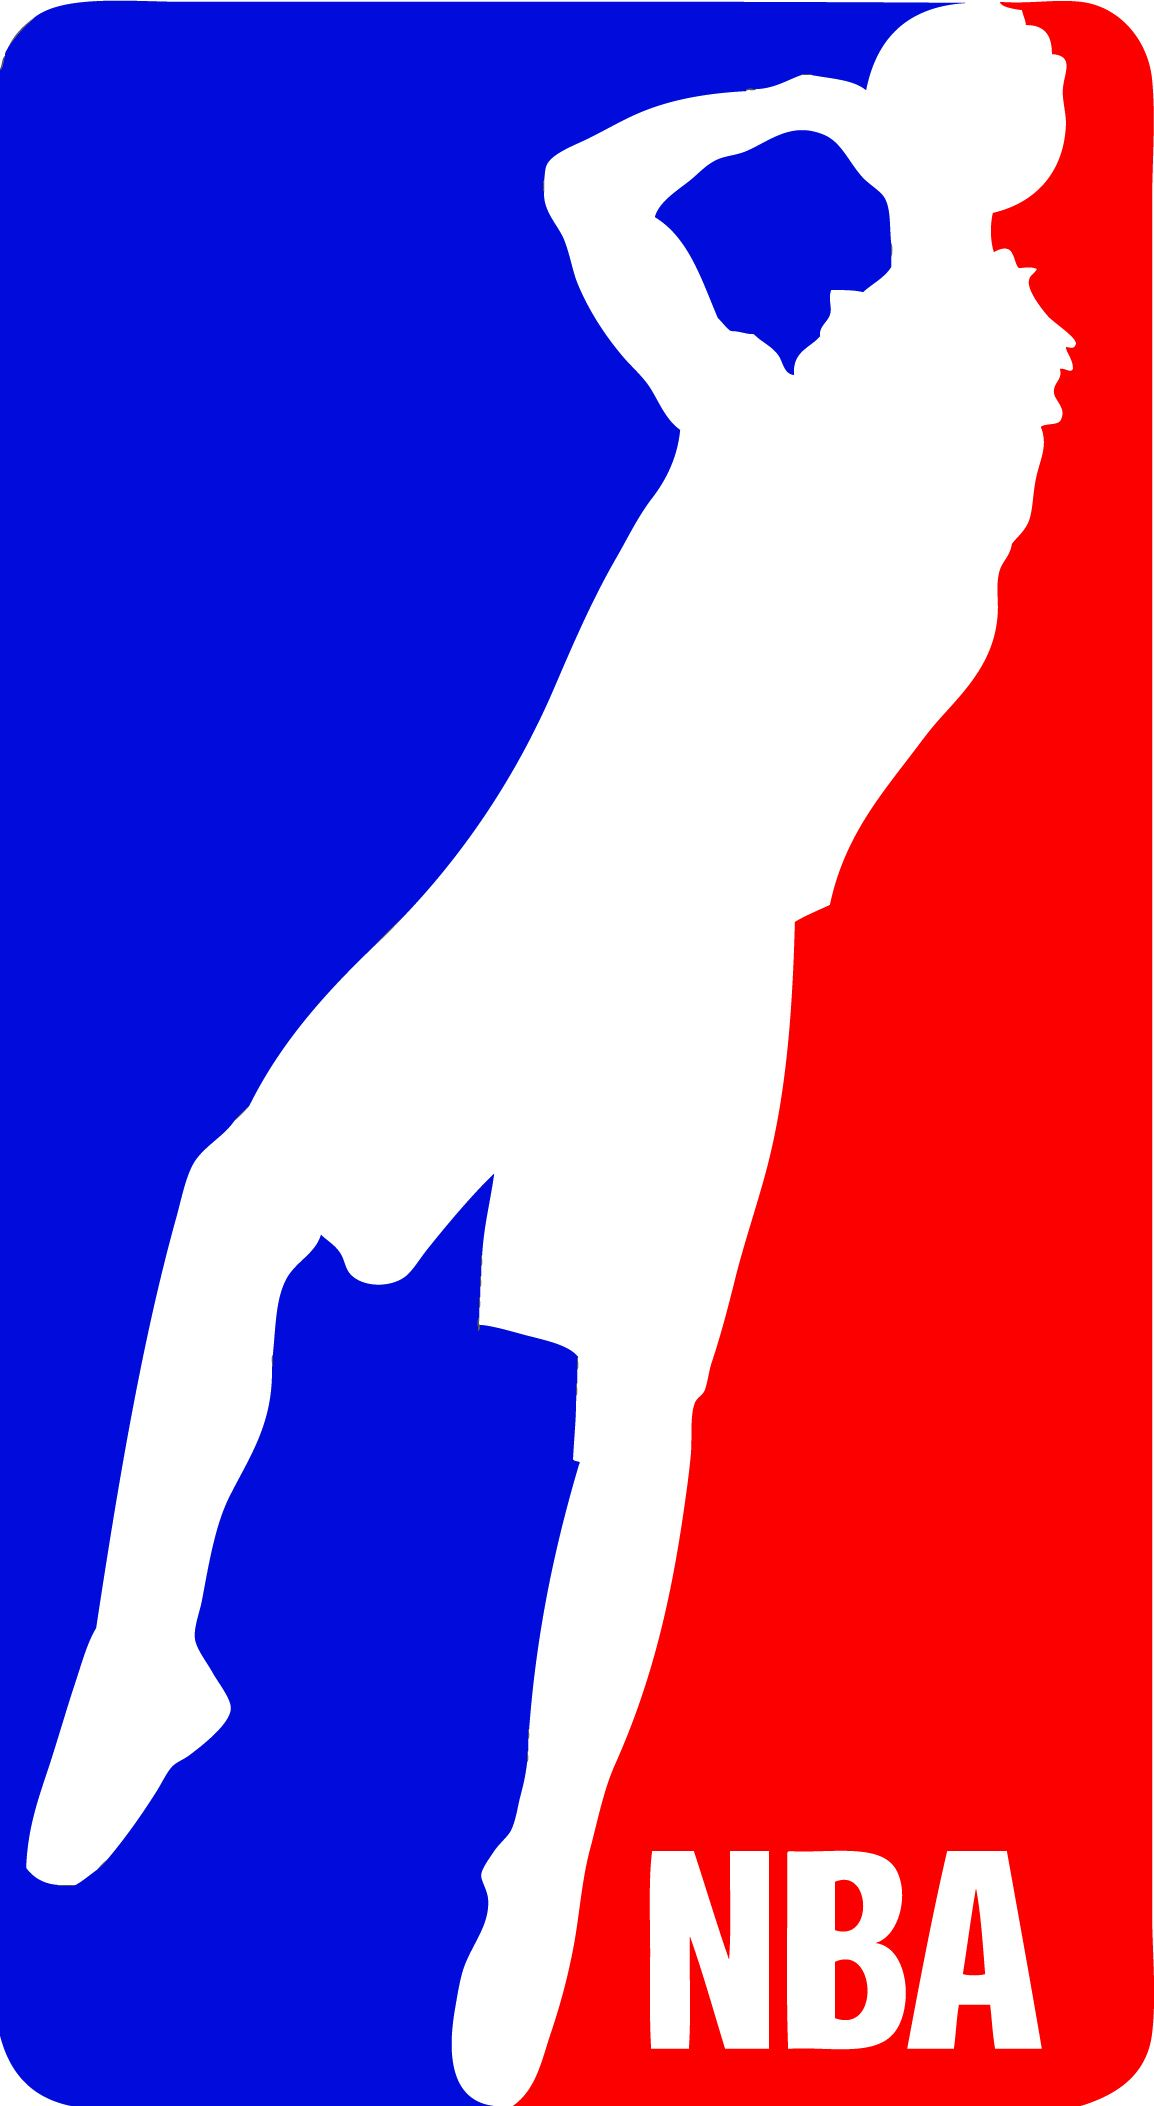 1154x2106 Draw An Air Jordan Logo Of Your Favorite Player. Nba